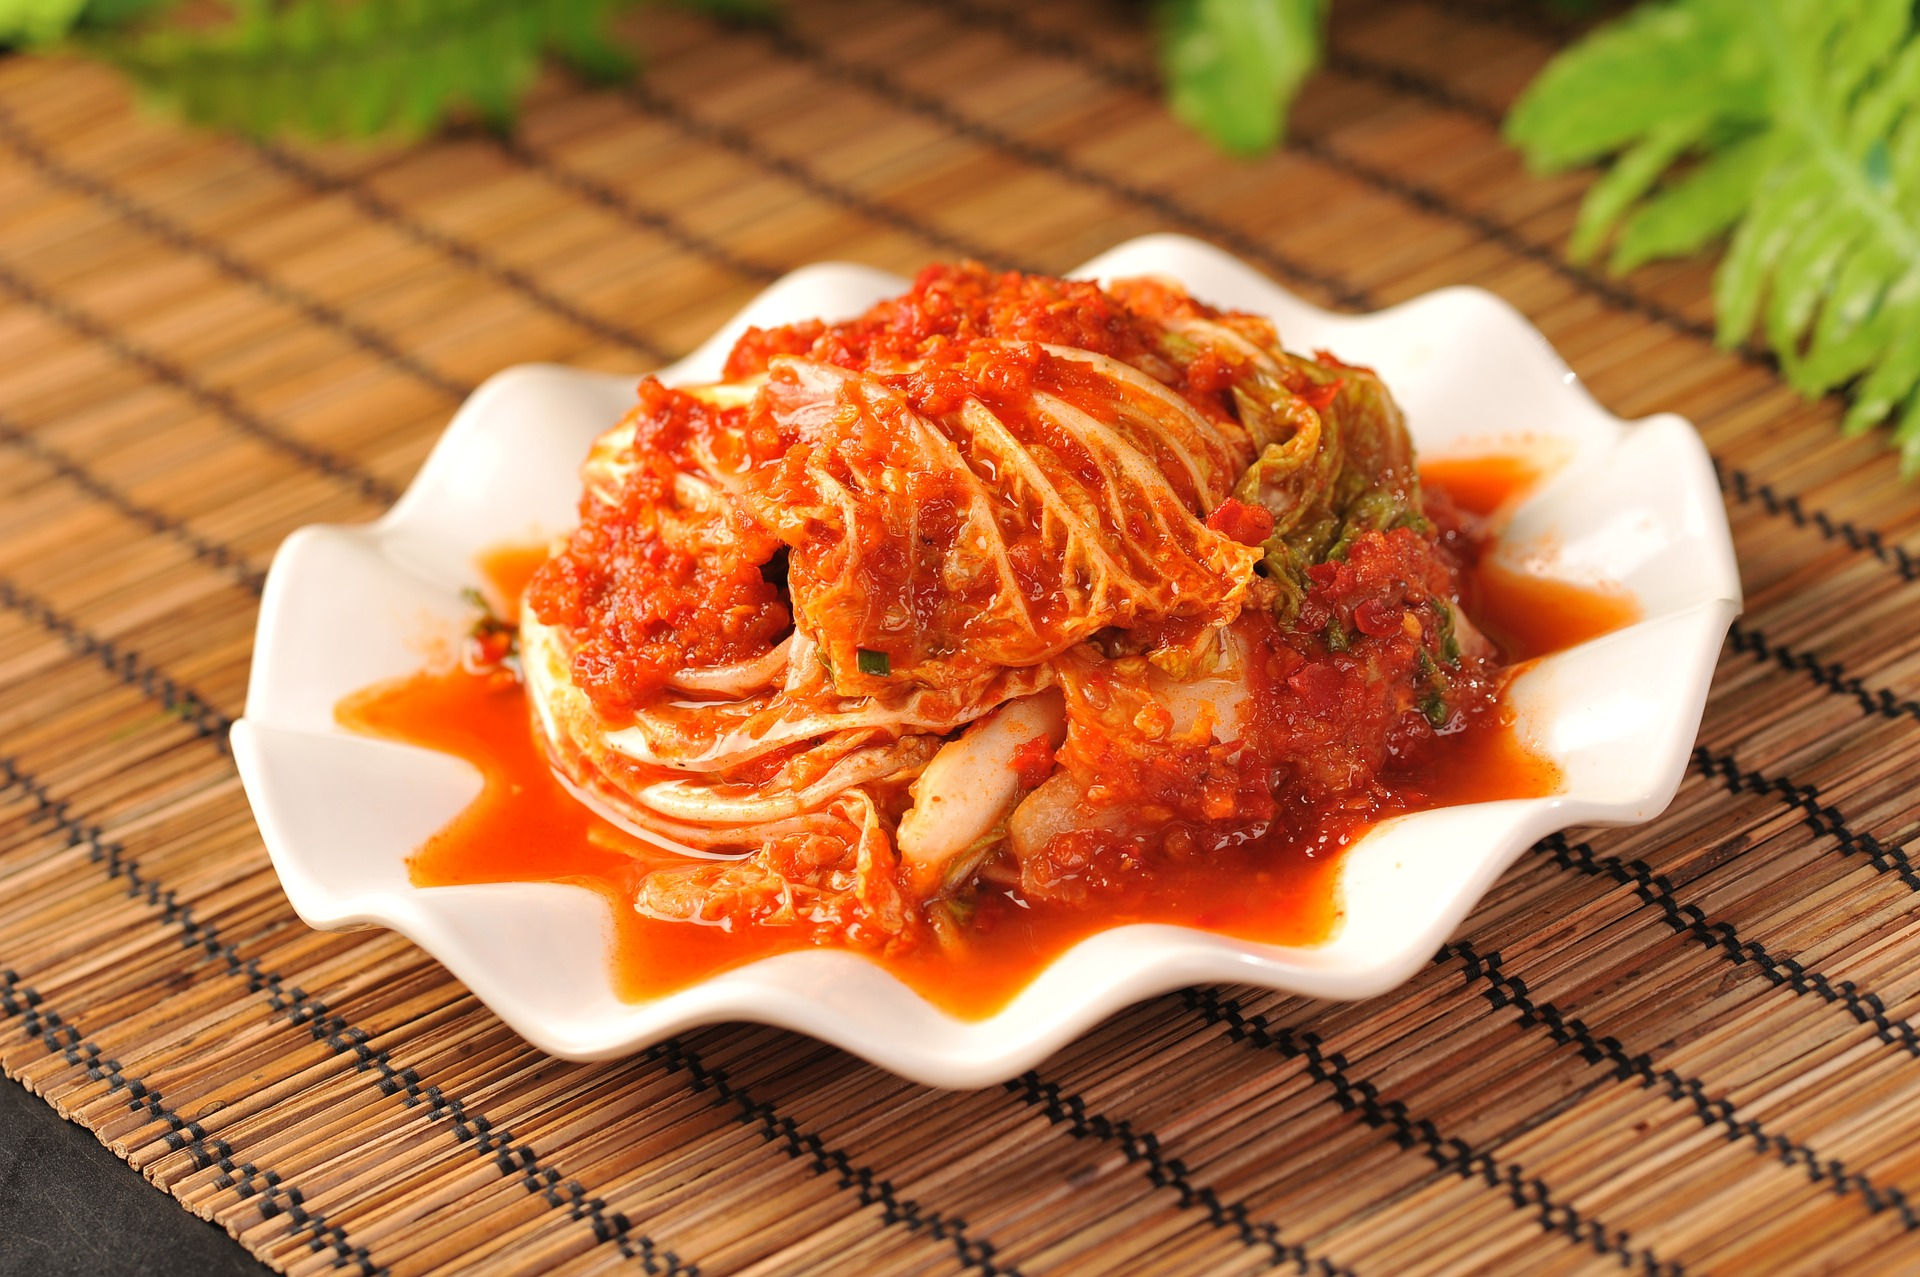 Senfkohl in chili sauce.